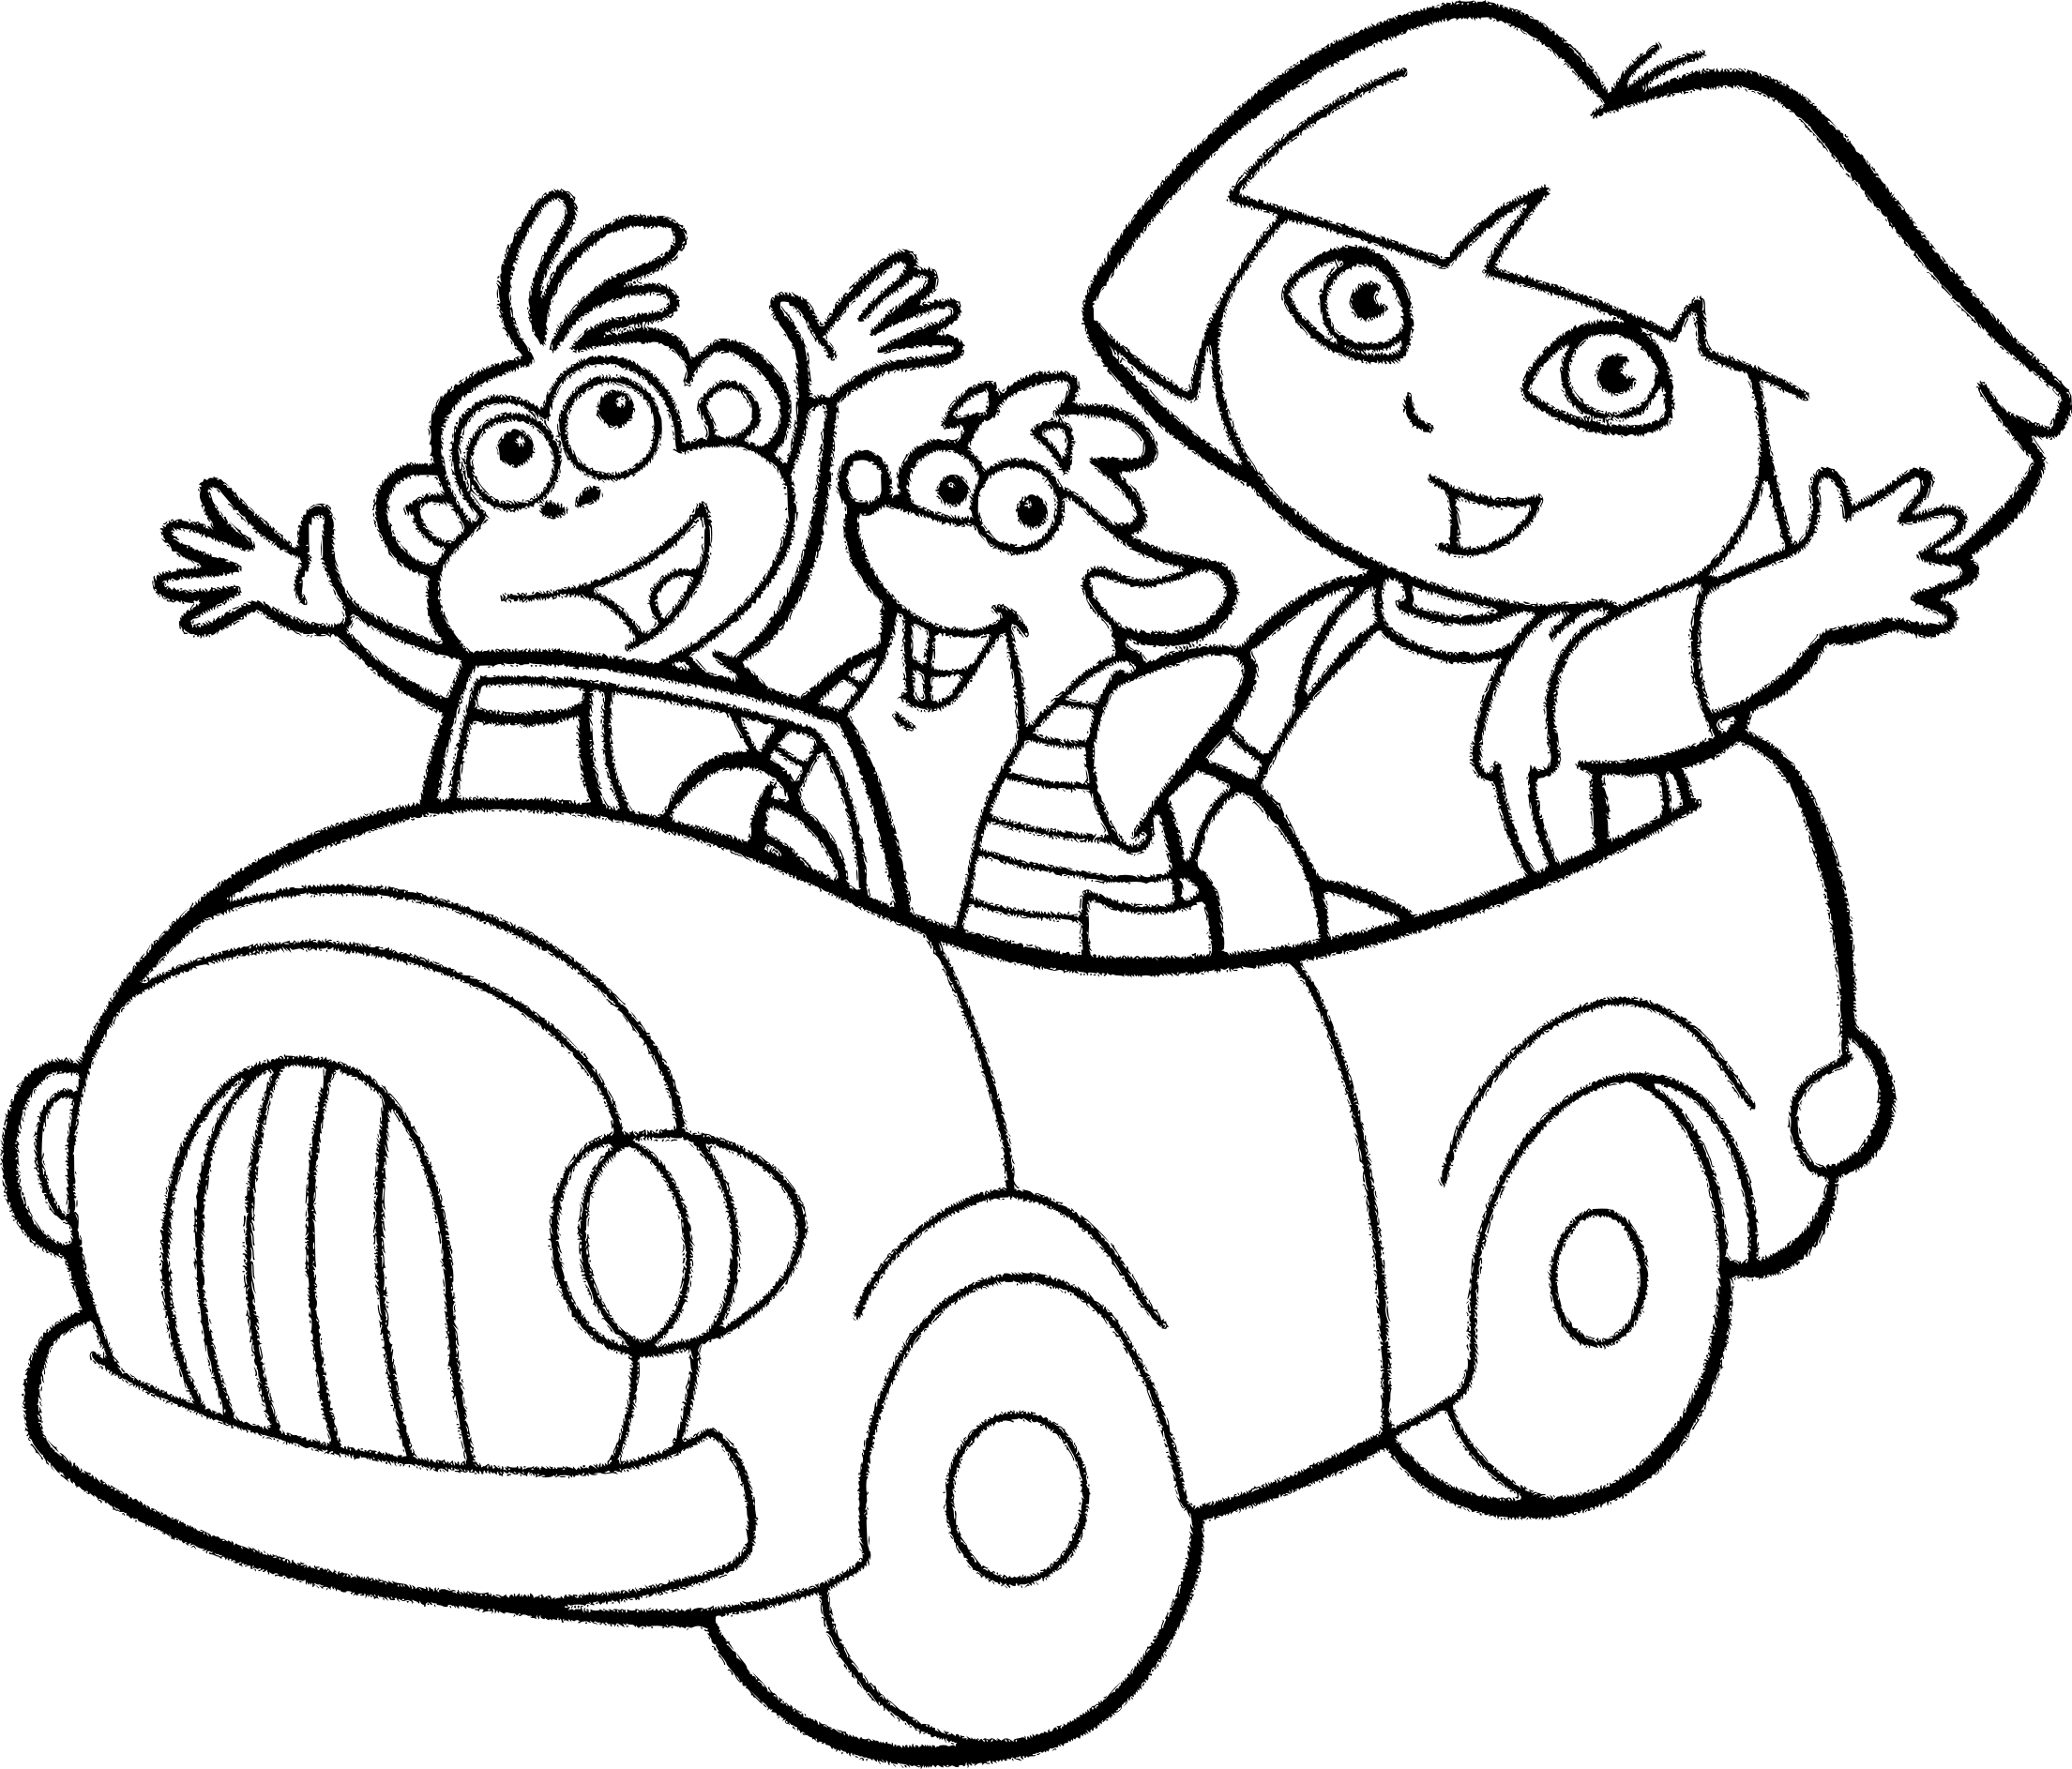 Coloriage Dora voiture